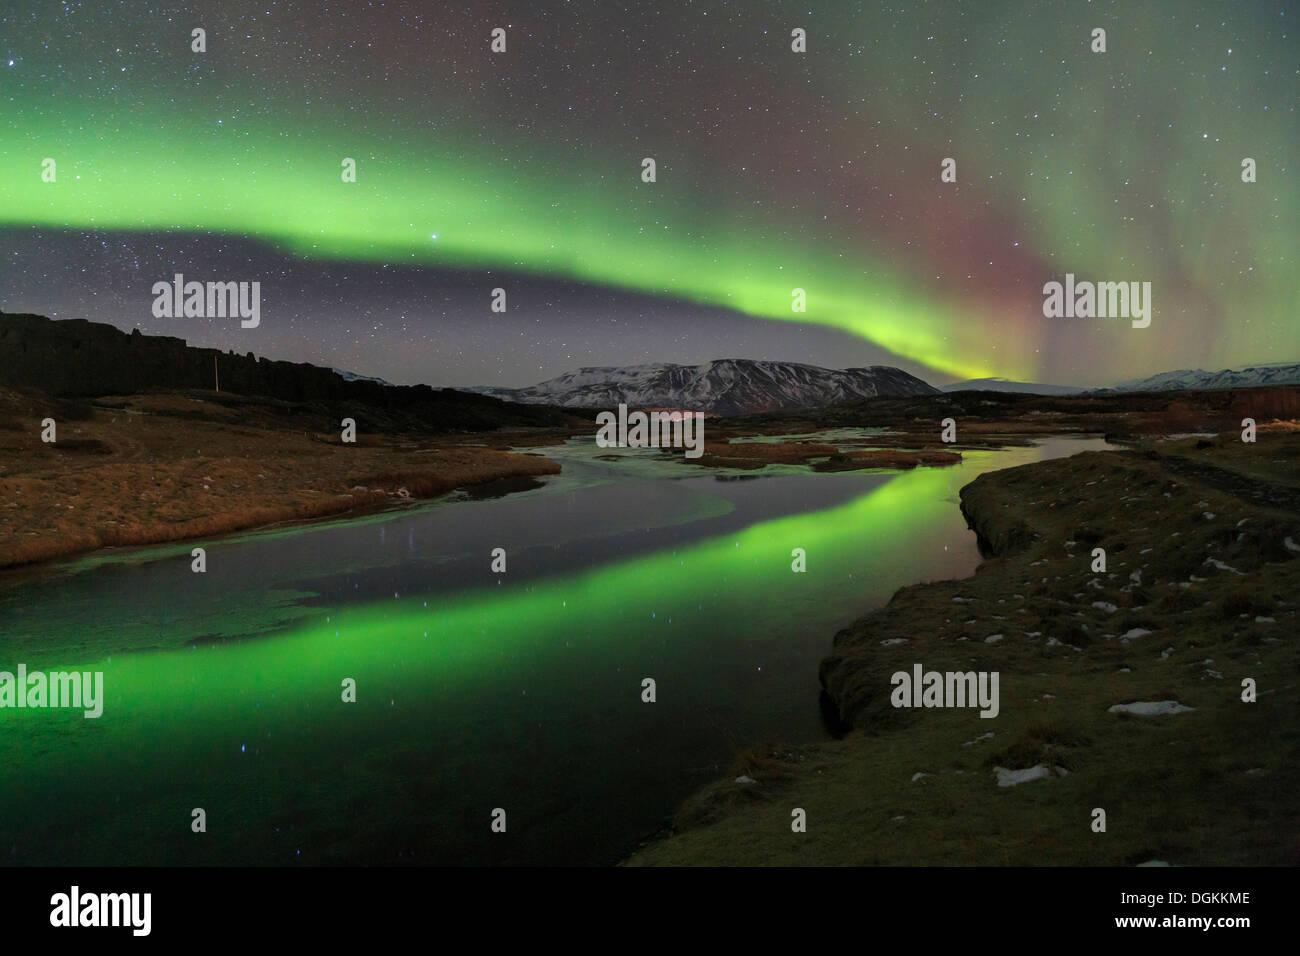 Aurora boreale sopra il lago Thingvallavatn a Thingvellir National Park in Islanda. Immagini Stock